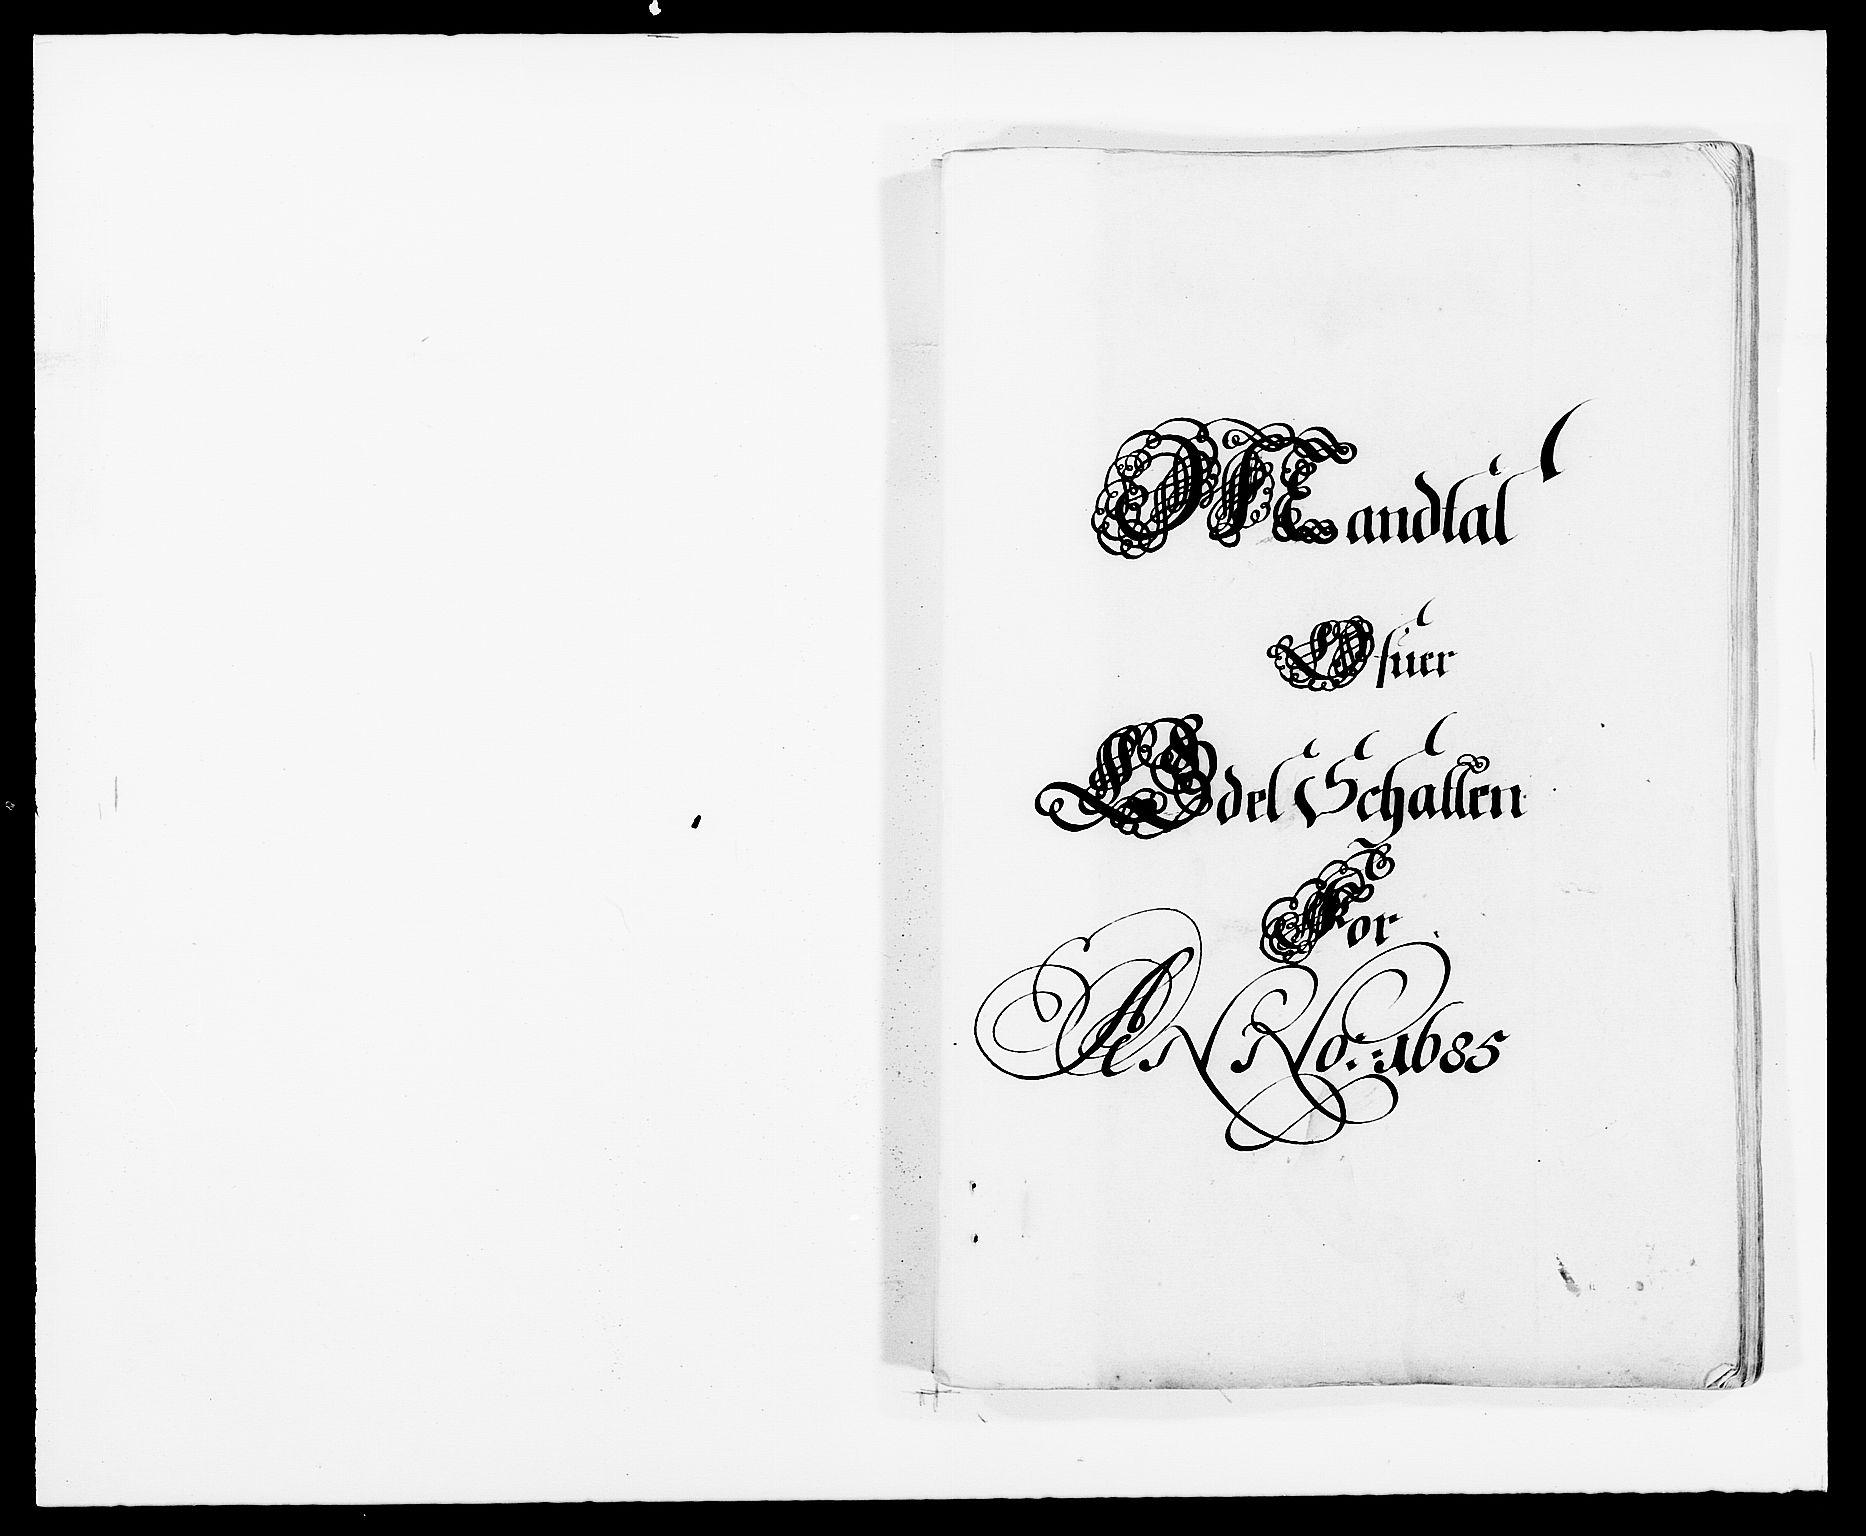 RA, Rentekammeret inntil 1814, Reviderte regnskaper, Fogderegnskap, R32/L1856: Fogderegnskap Jarlsberg grevskap, 1685, s. 167